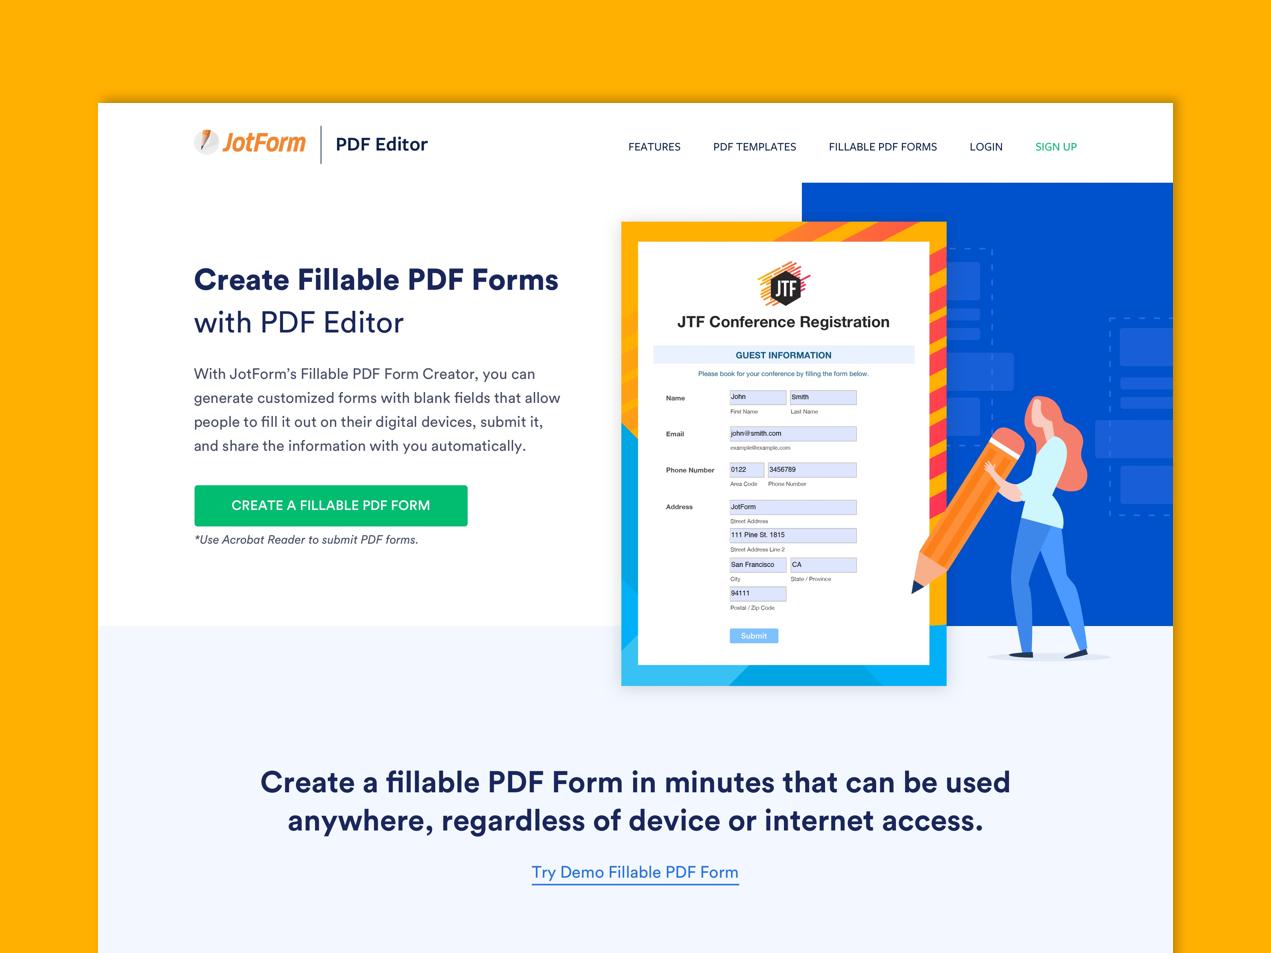 JotForm - Fillable PDF Form Landing by Mercan Alper on Dribbble